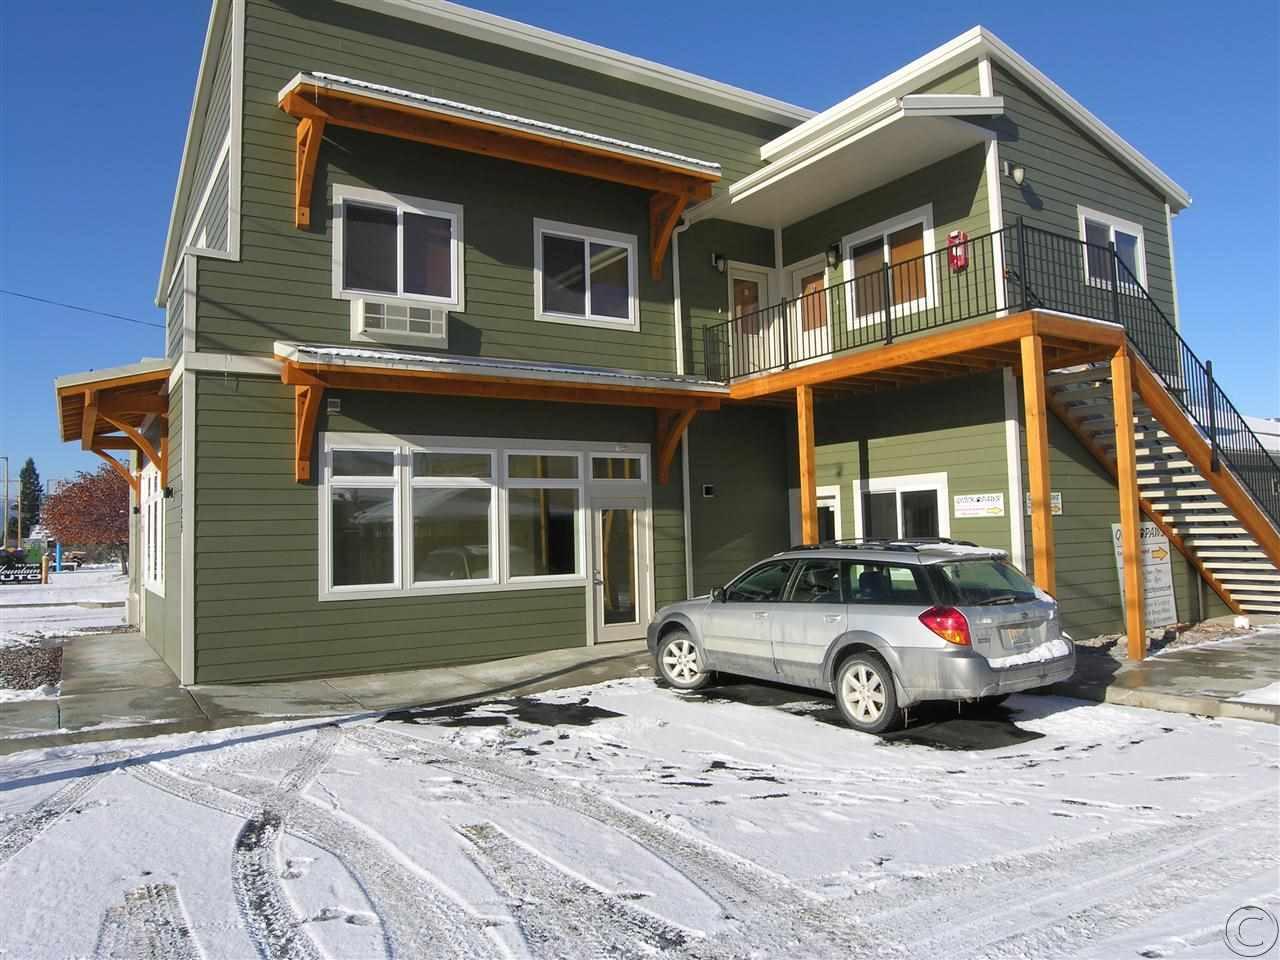 Rental Homes for Rent, ListingId:29697427, location: 1720 S 3rd Street W Missoula 59801